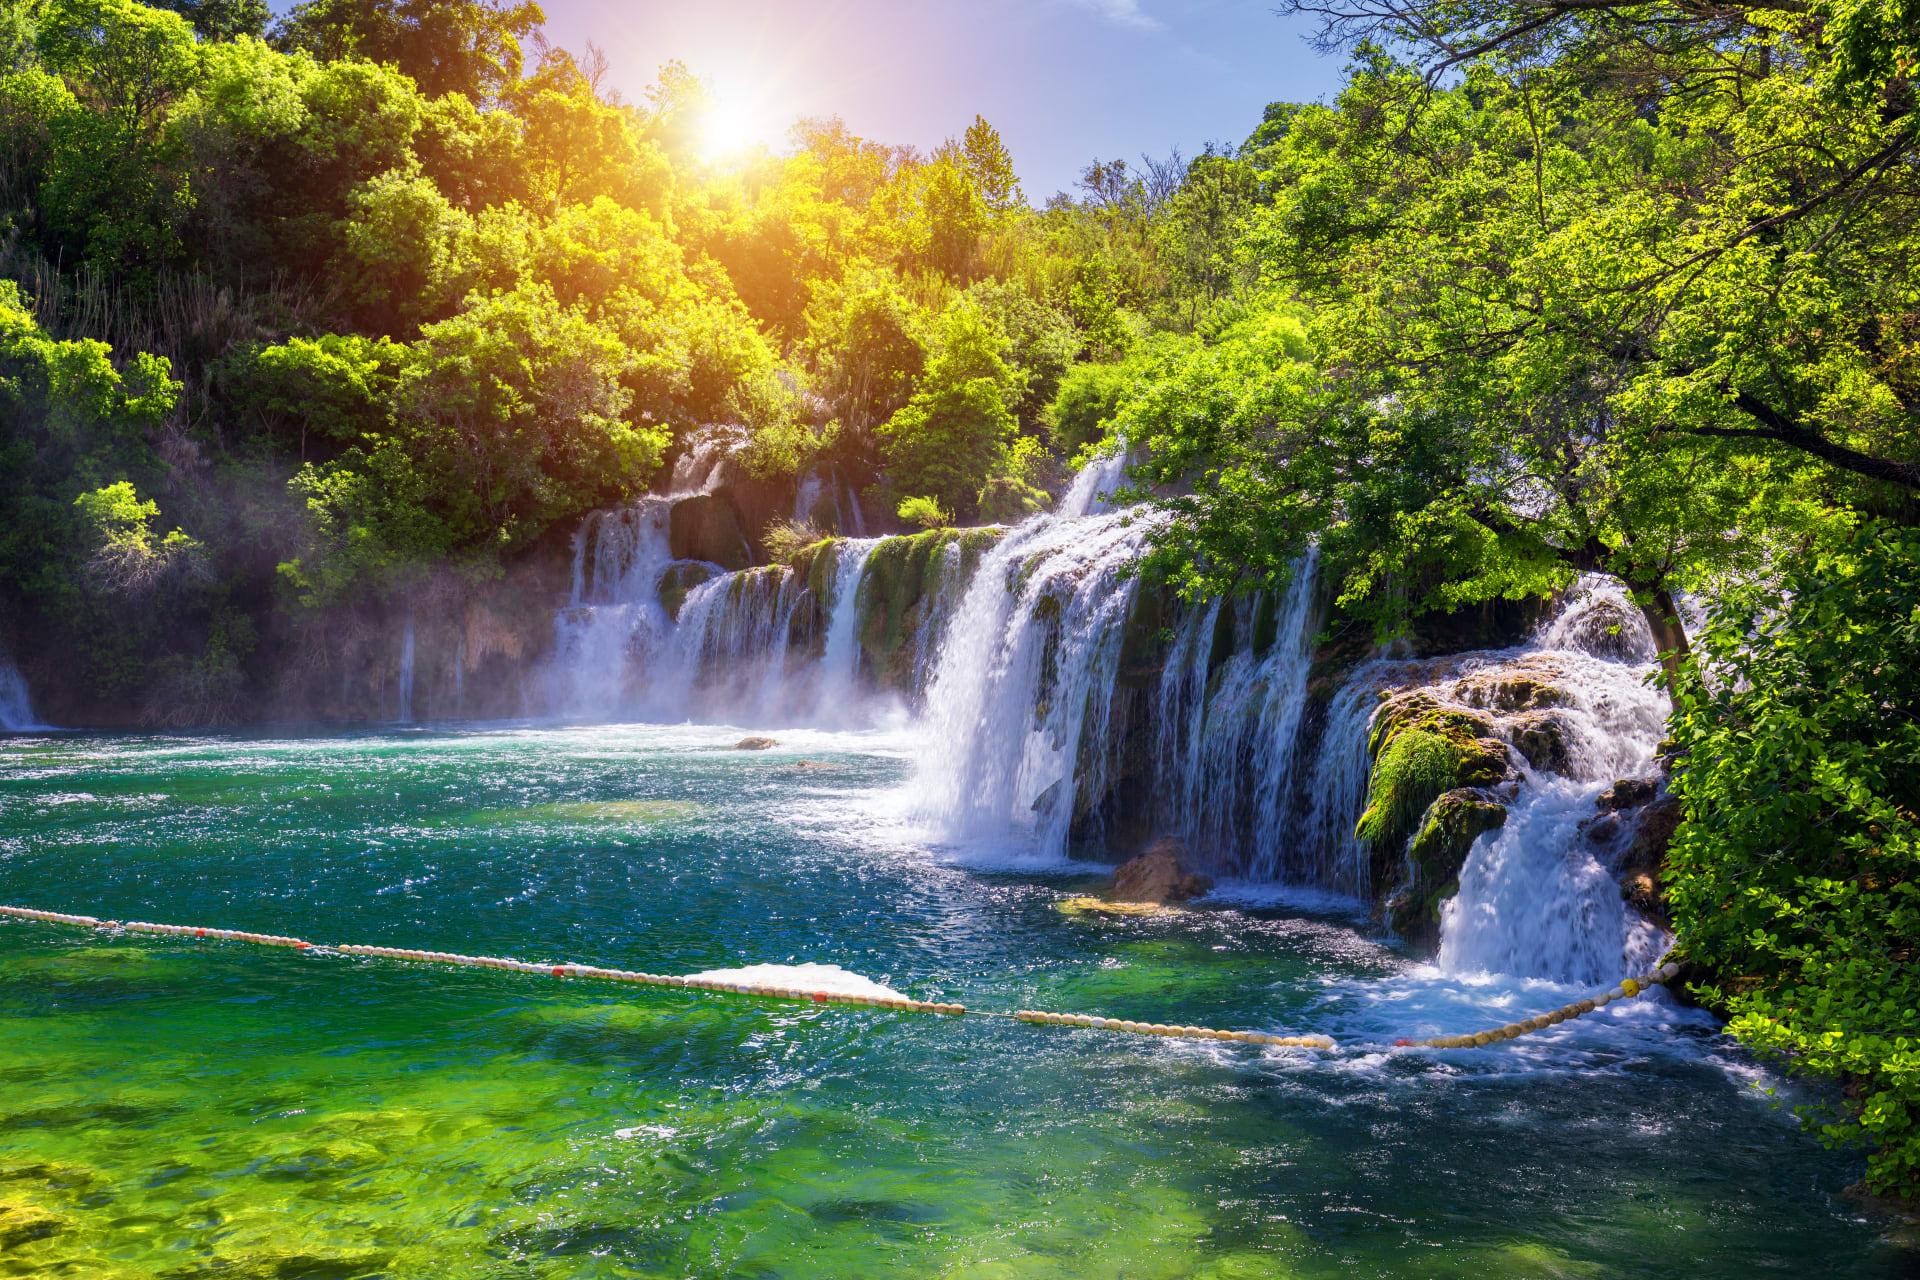 Krka National Park - Krka Waterfalls (Skradinski Buk) – A Story Told by Water